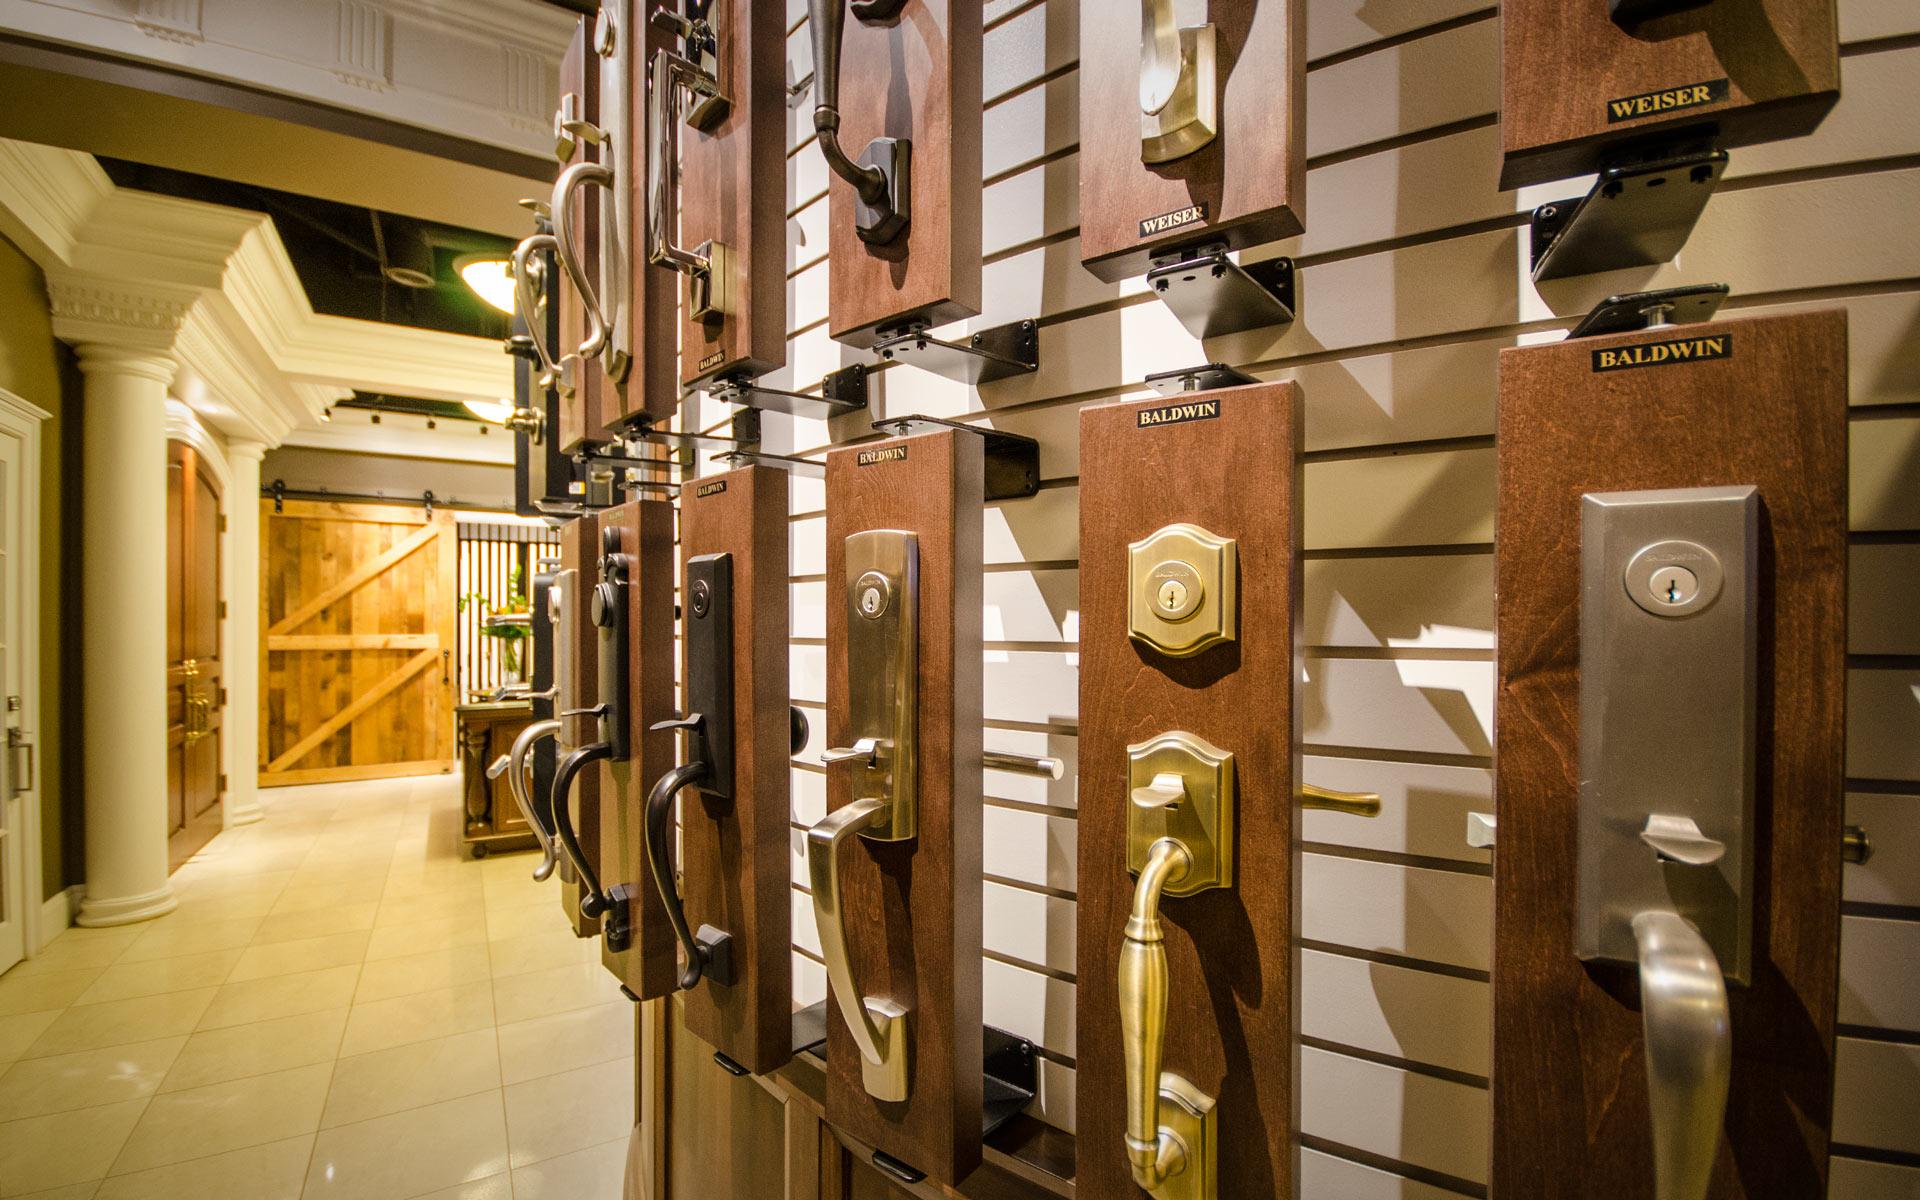 Door Hardware - decorative builders hardware, speciality hardware or barn door track hardware at Designer Showcase powered by Turkstra Lumber.